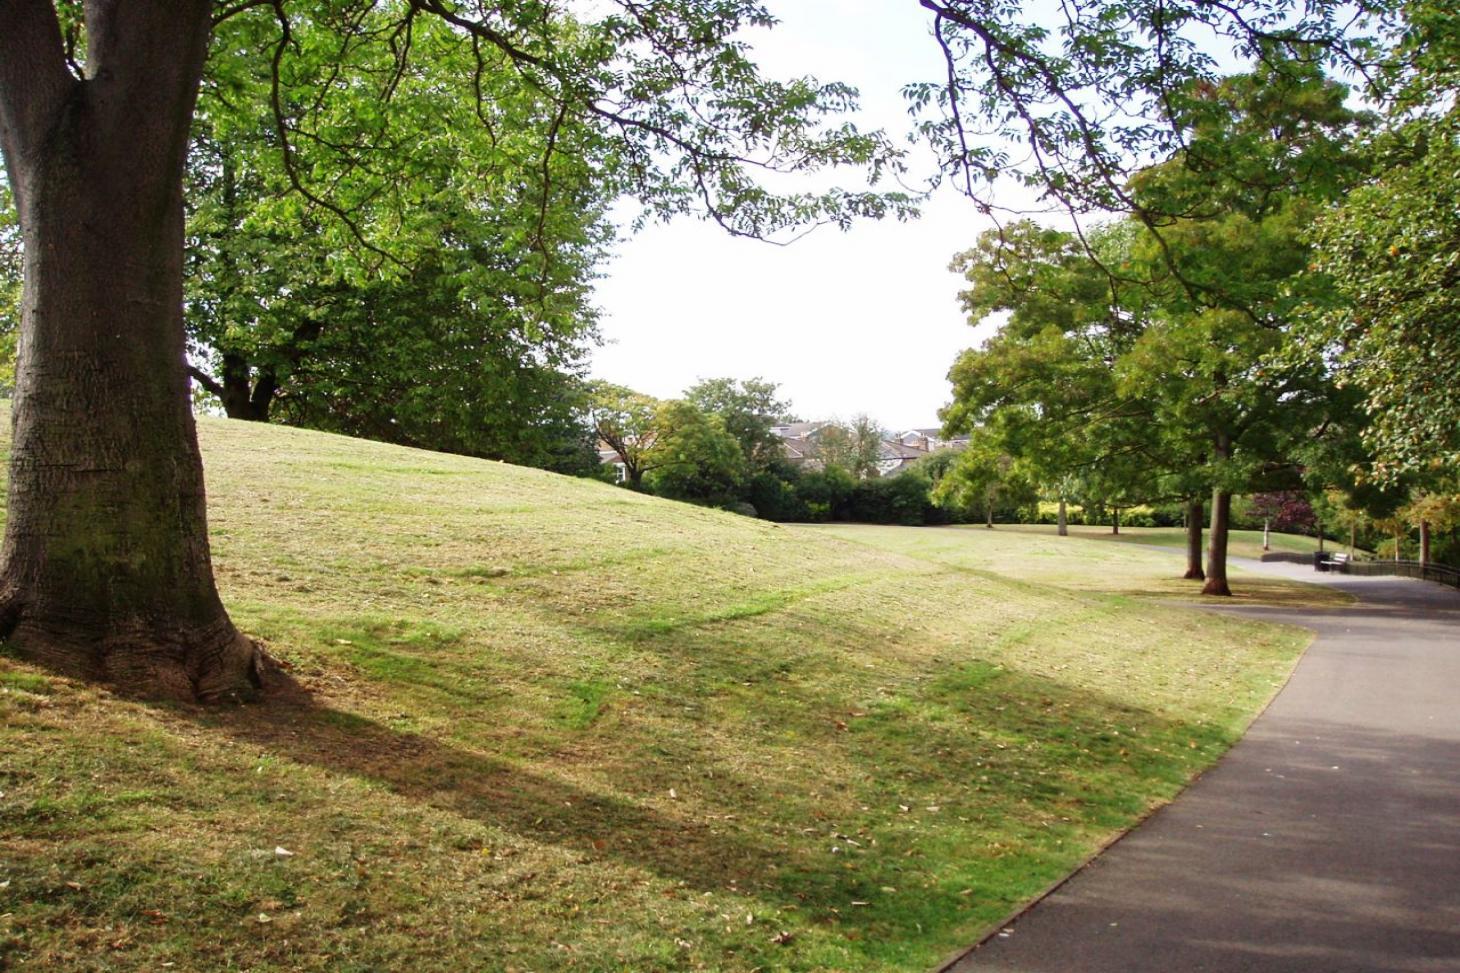 Telegraph Hill Park 5 a side | Concrete football pitch